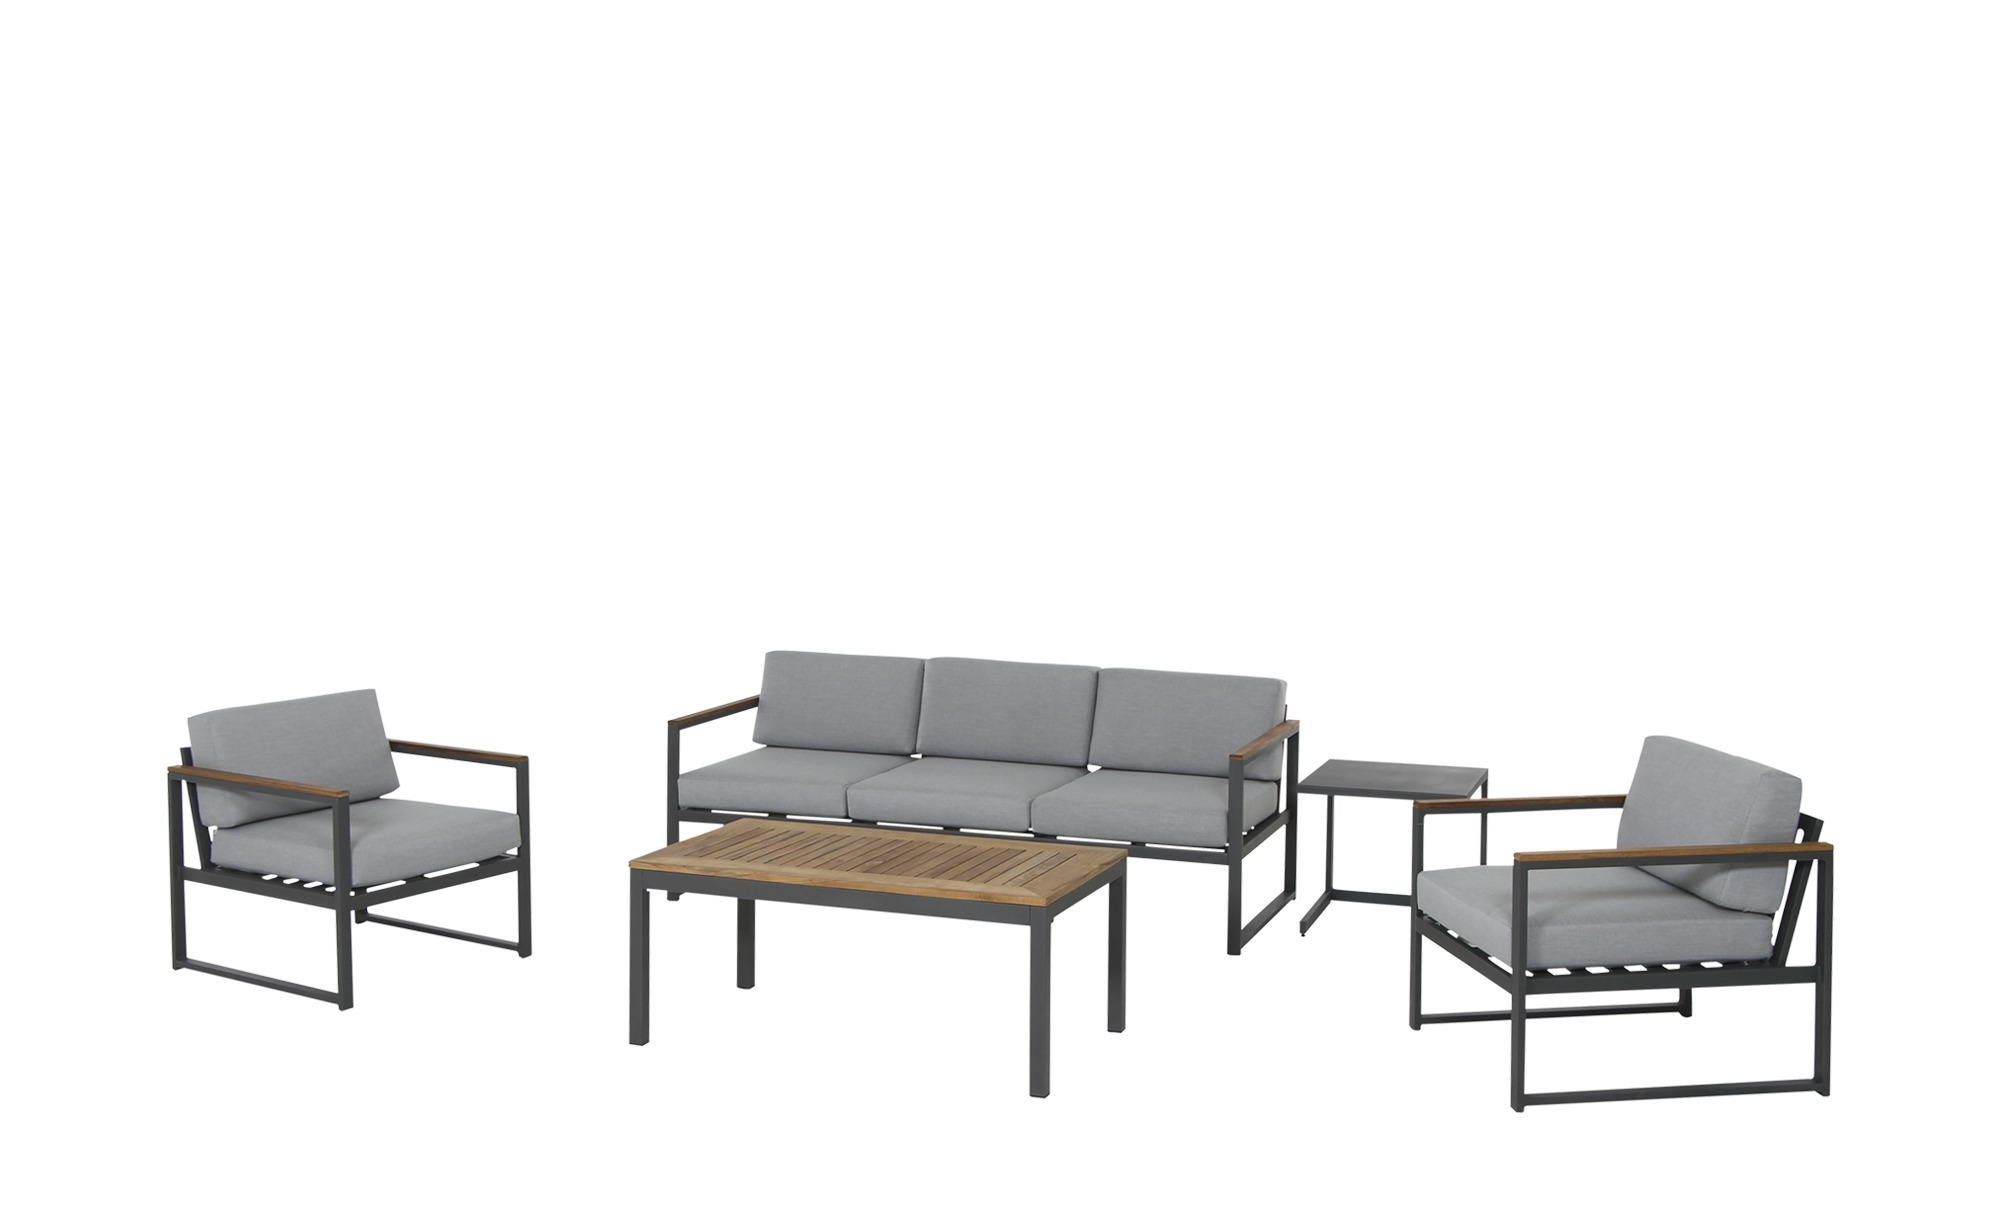 Loungeset   Campo ¦ grau Garten > Gartenmöbel > Gartenmöbel Sets - Höffner